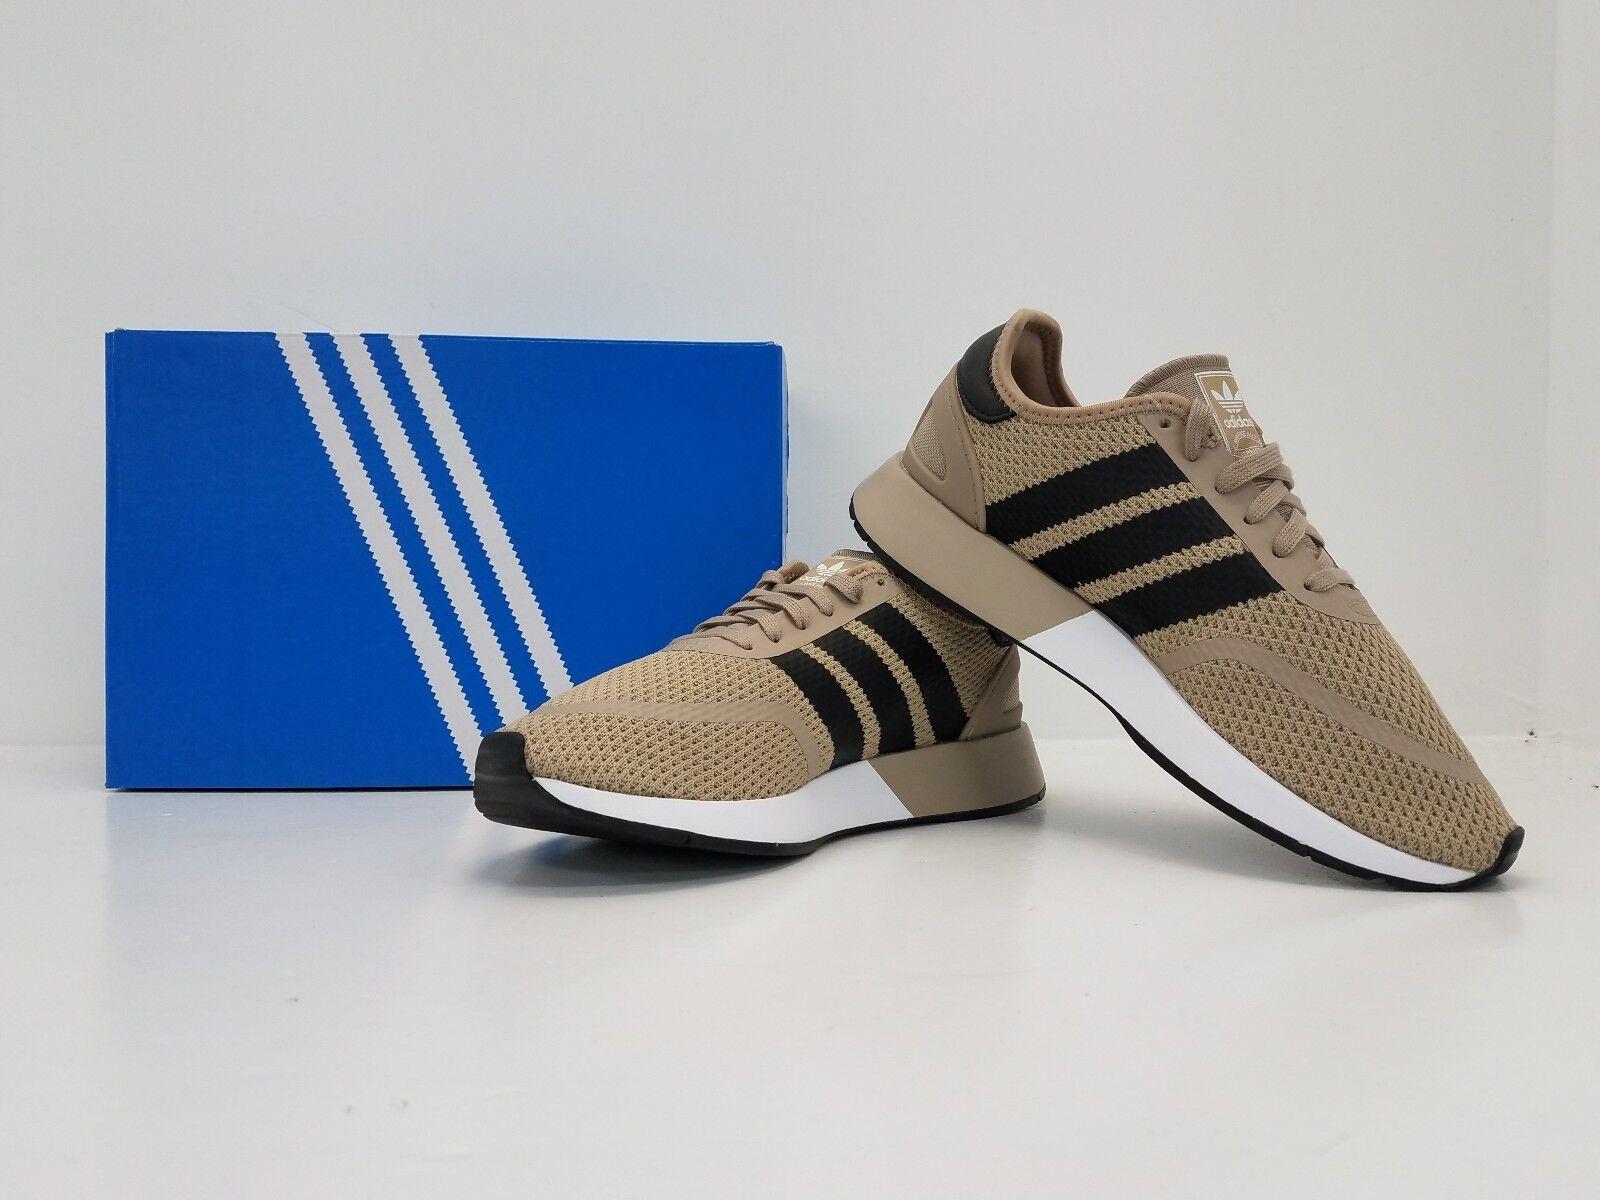 Adidas originals männer n-5923 laufschuh b37955 khaki - / weiß - brand new in box